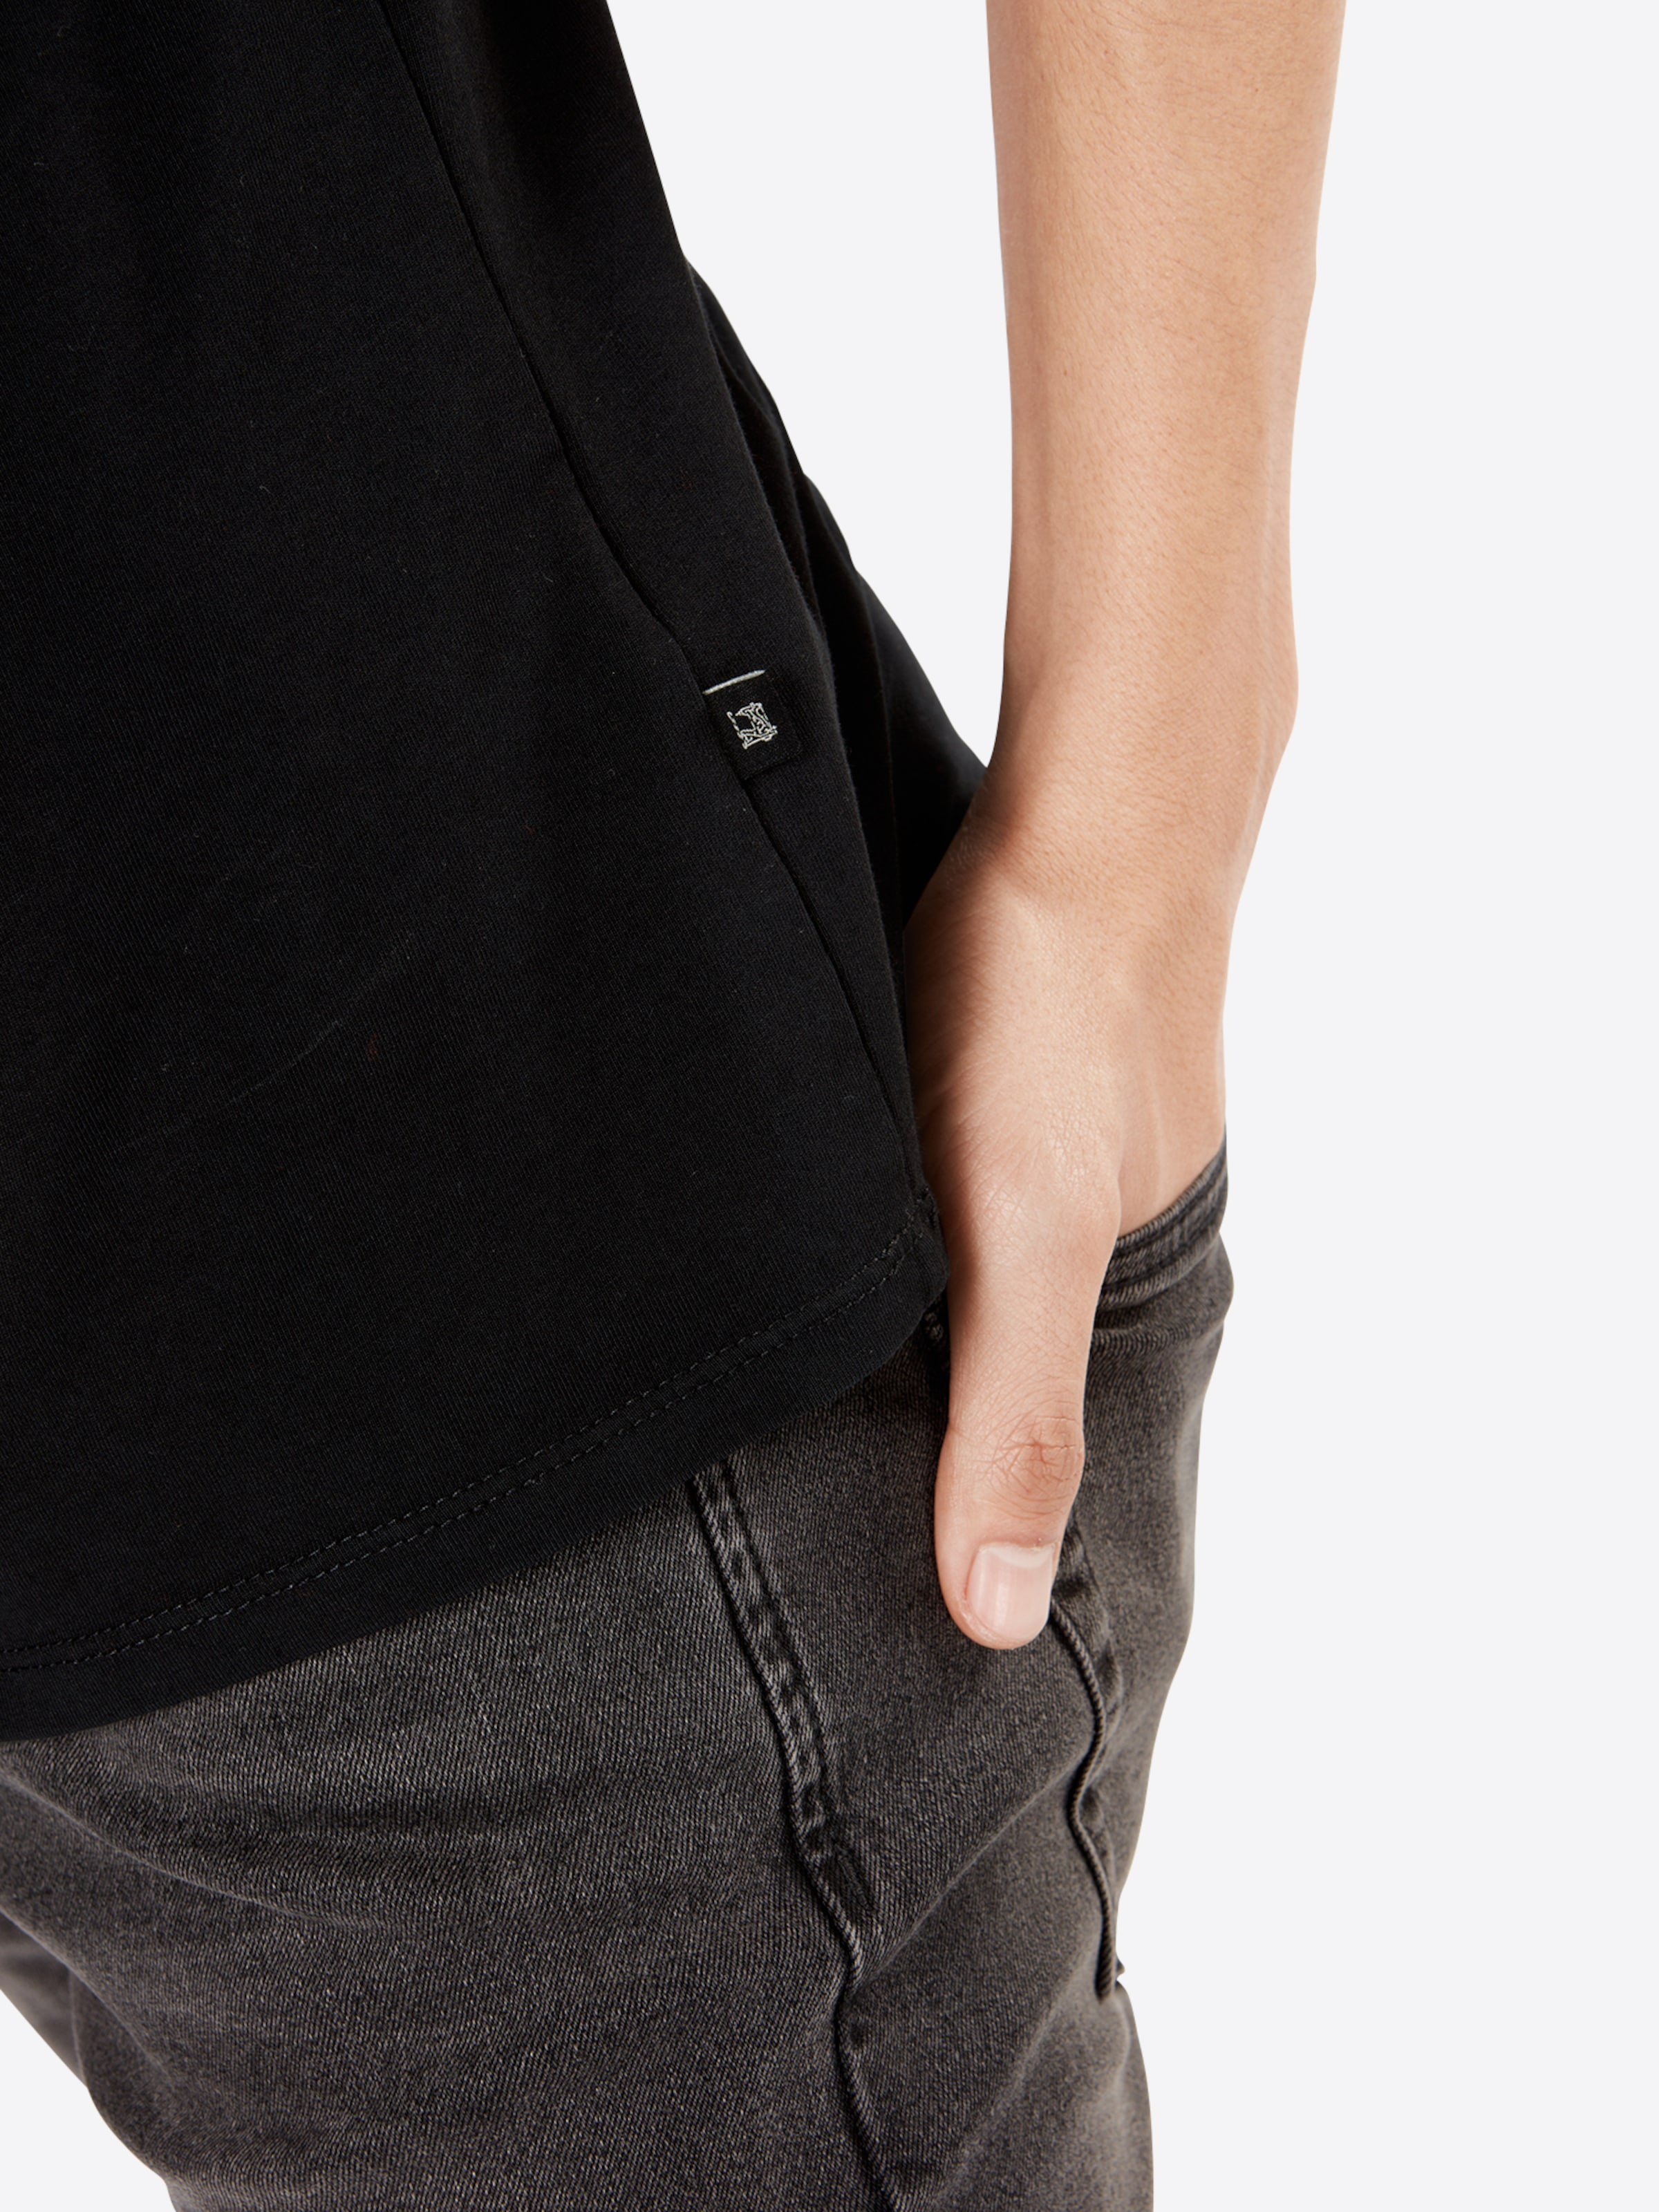 SCOTCH & SODA T-Shirt Outlet Top-Qualität UD45N6L4